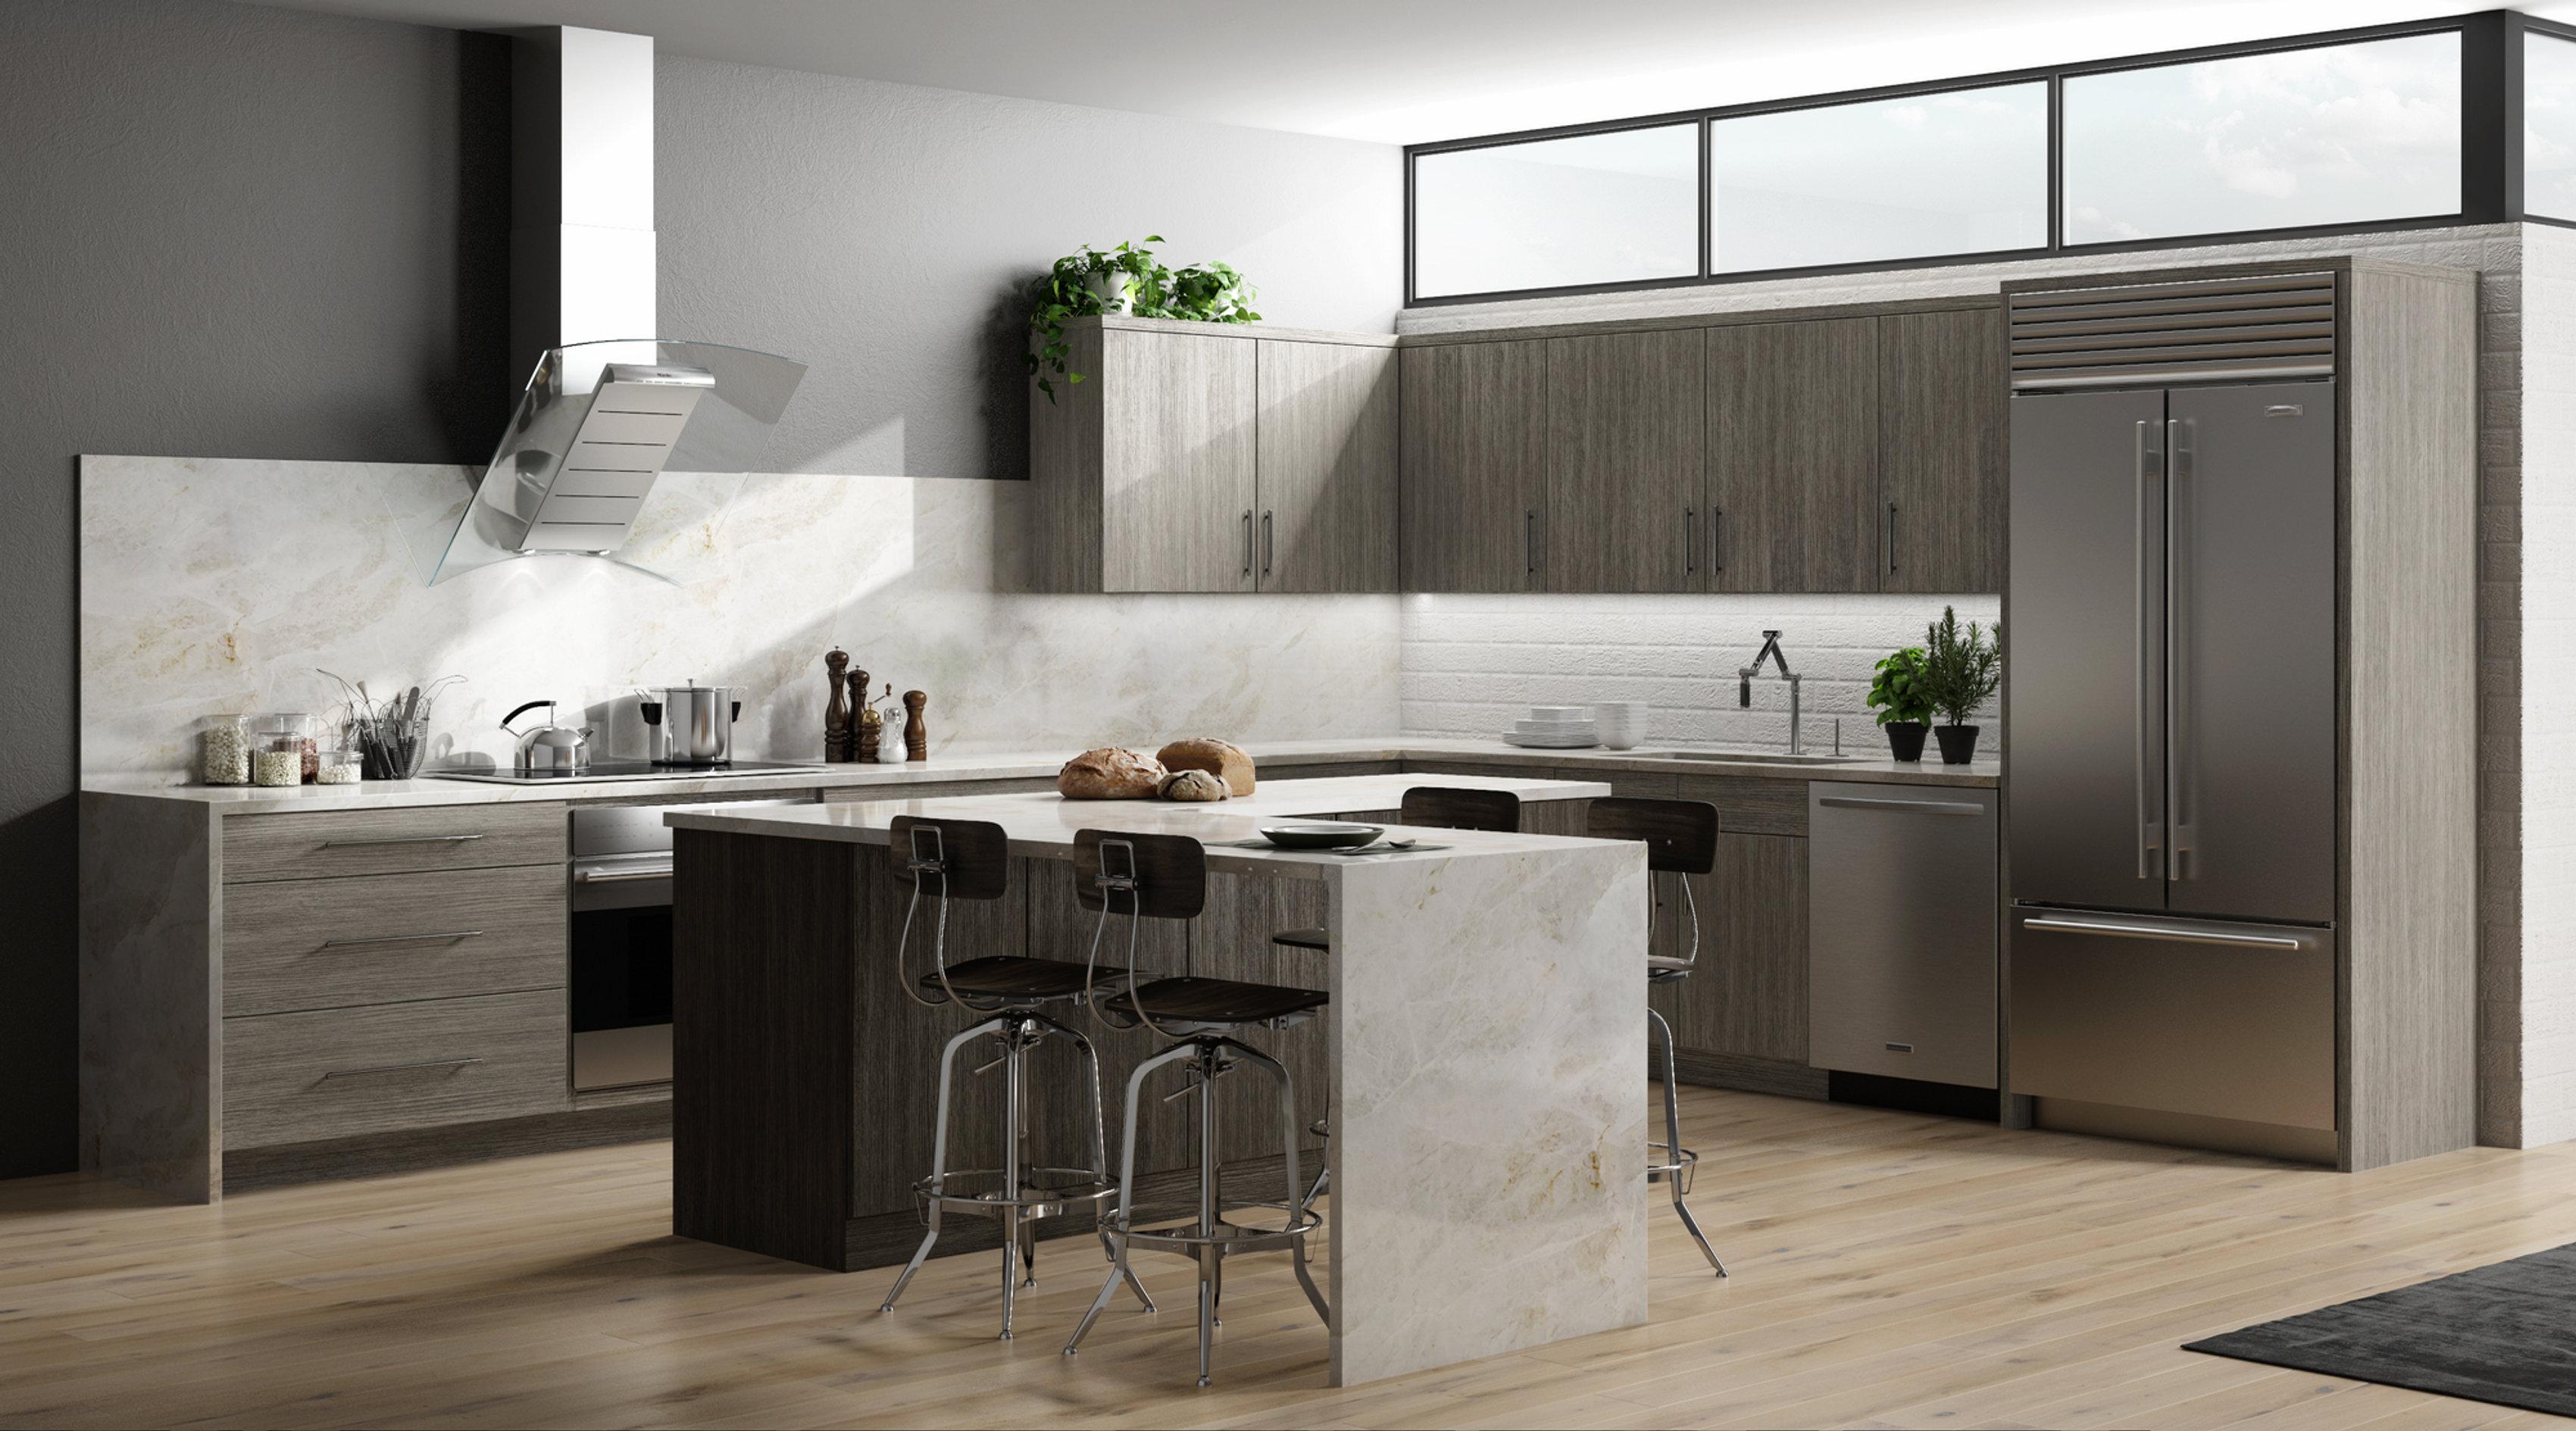 Matrix Silver Affordable Kitchen Cabinets